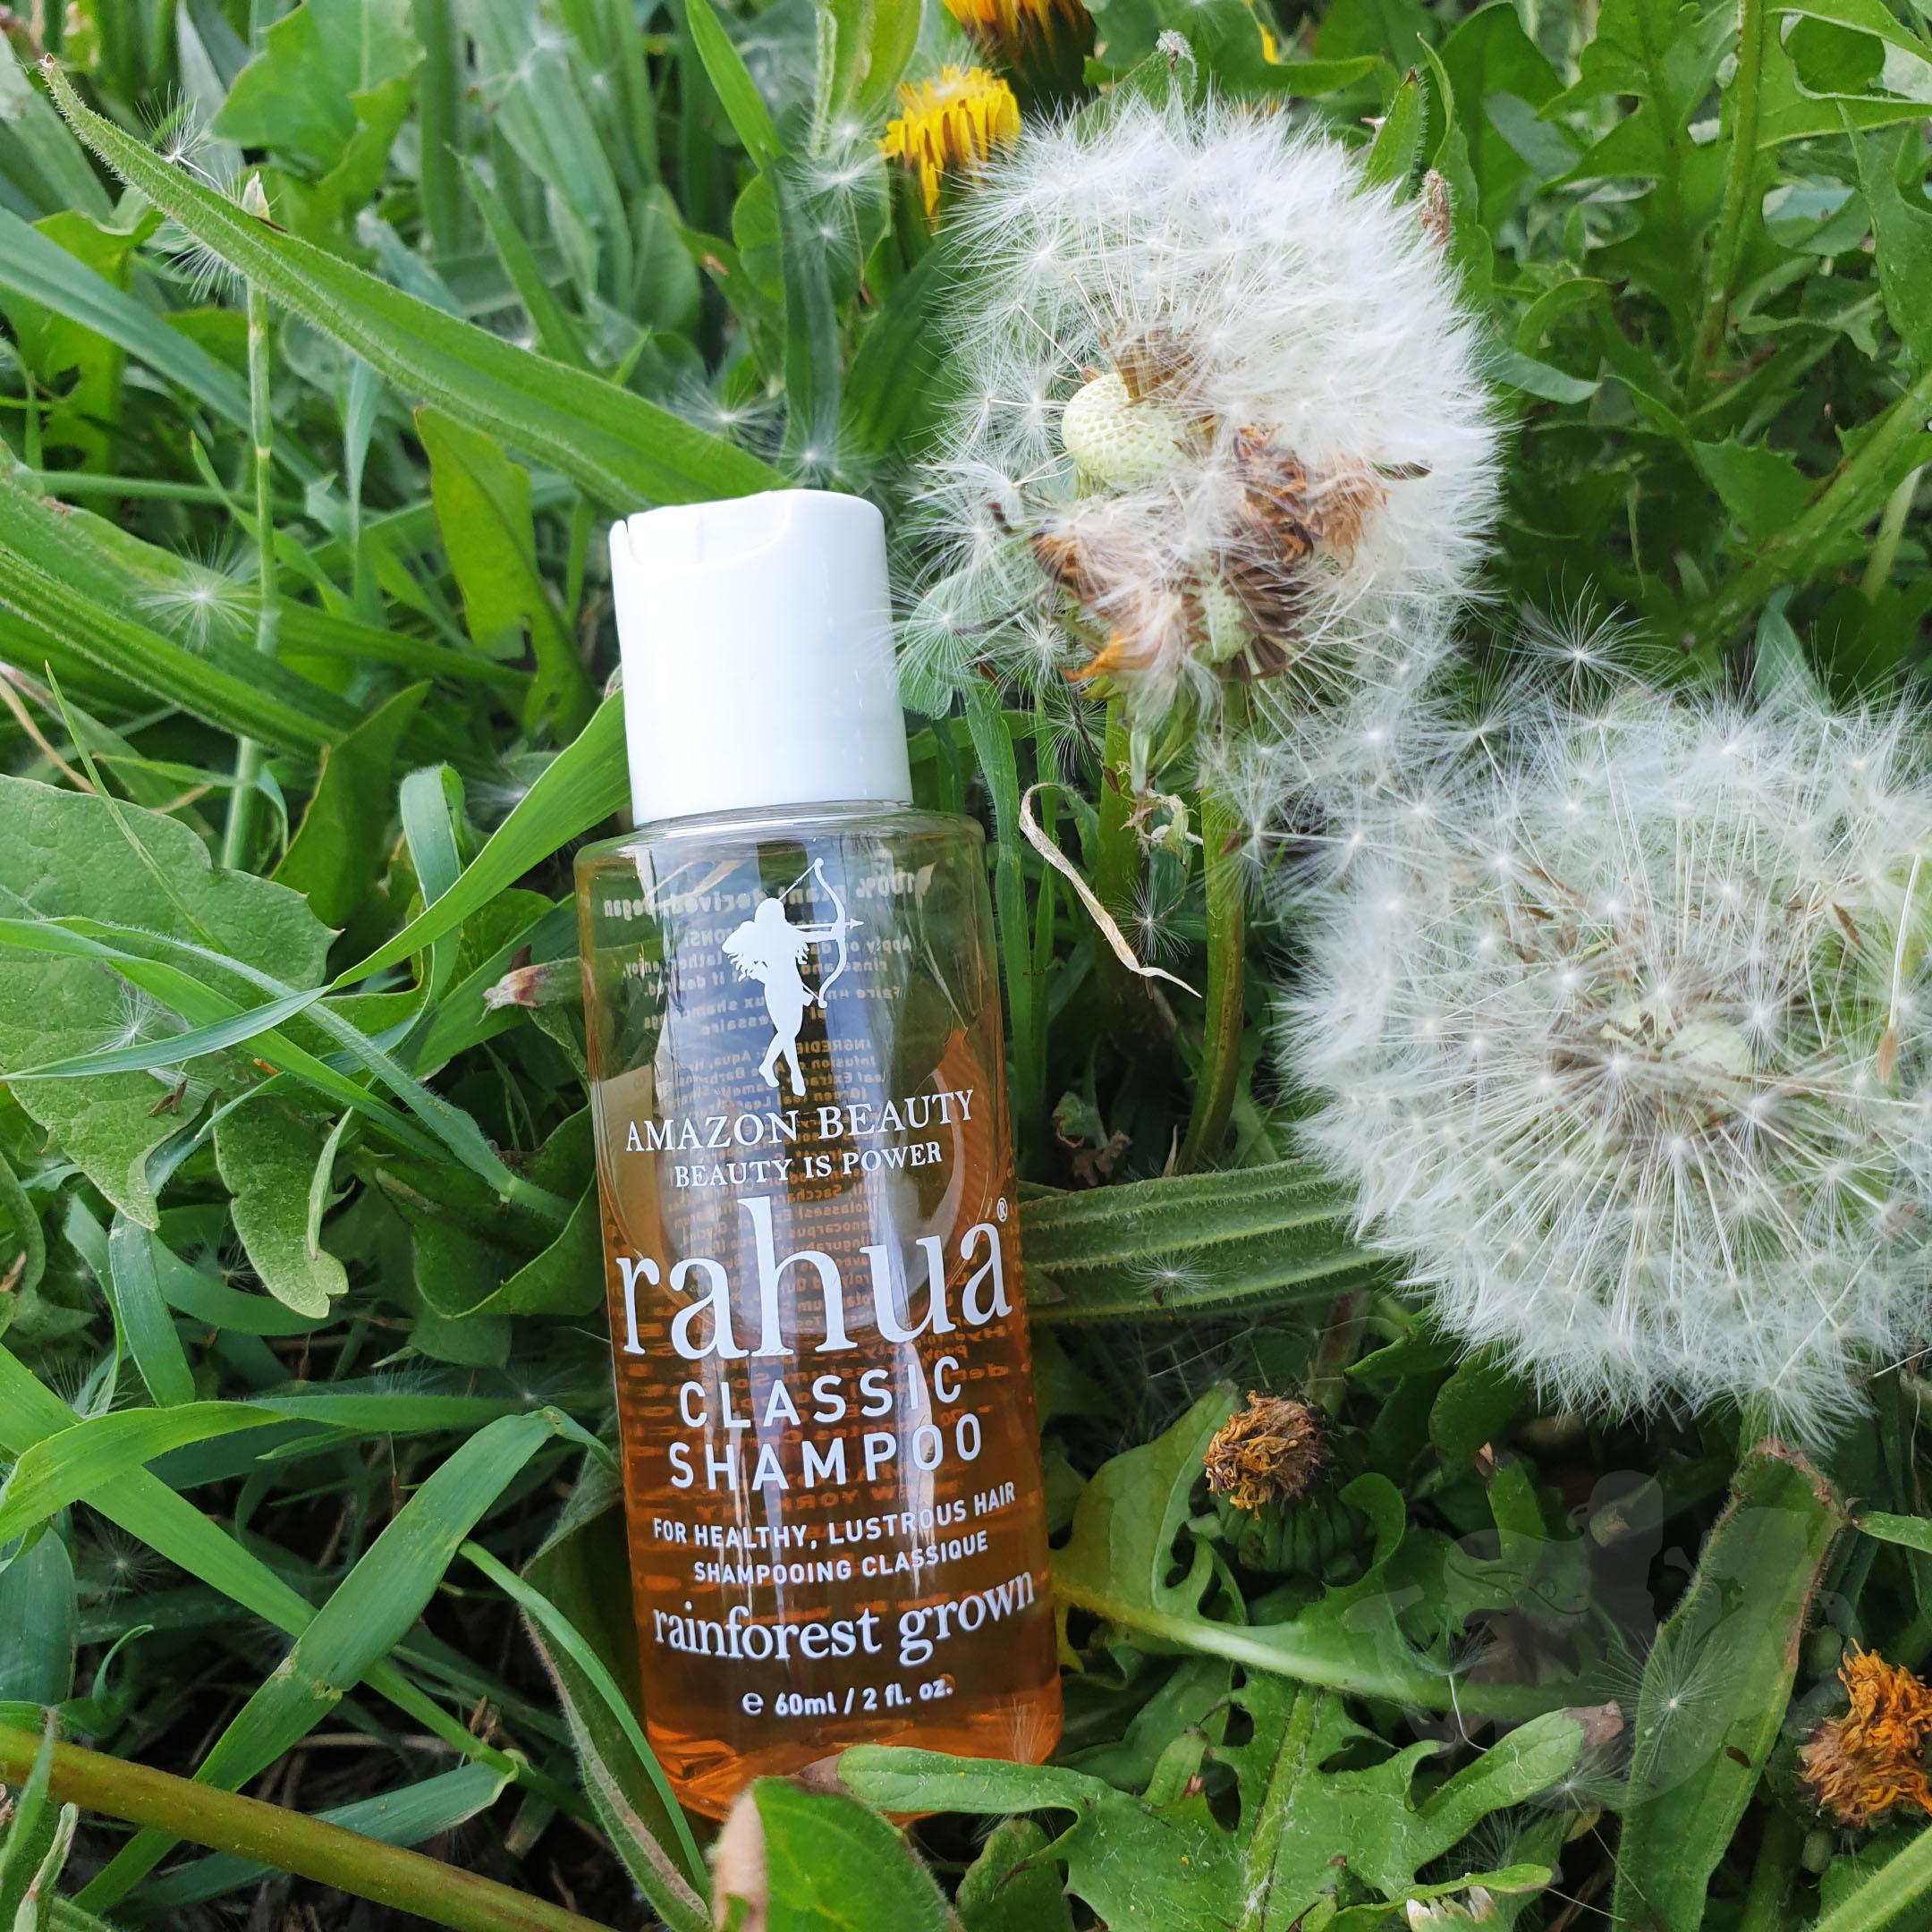 Classic Shampoo – Rahua